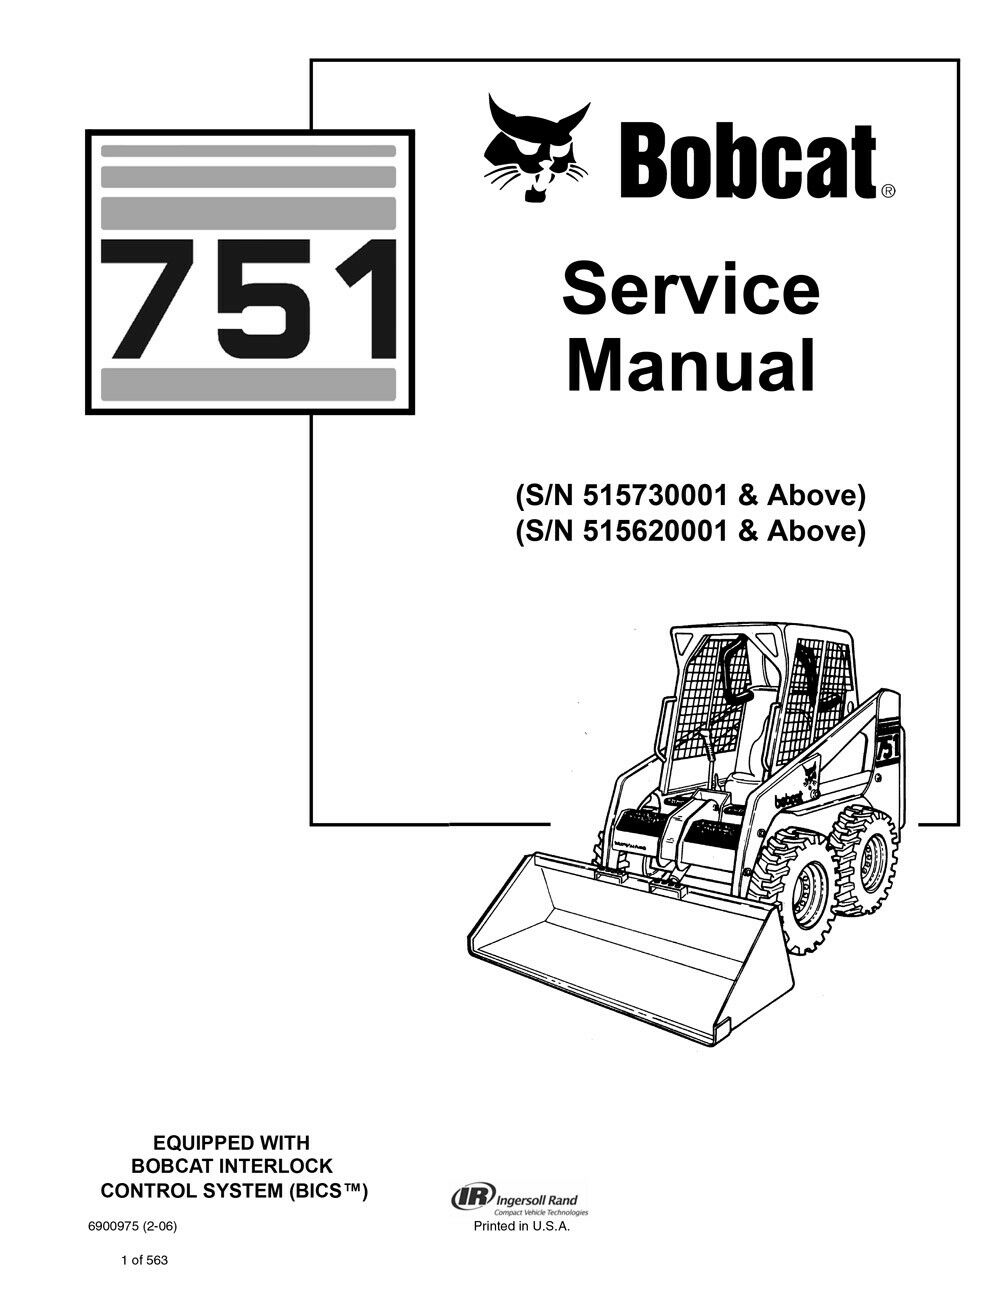 hight resolution of new bobcat 751 skid steer loader 2006 edition service repair manualbobcat 751 parts diagram 7